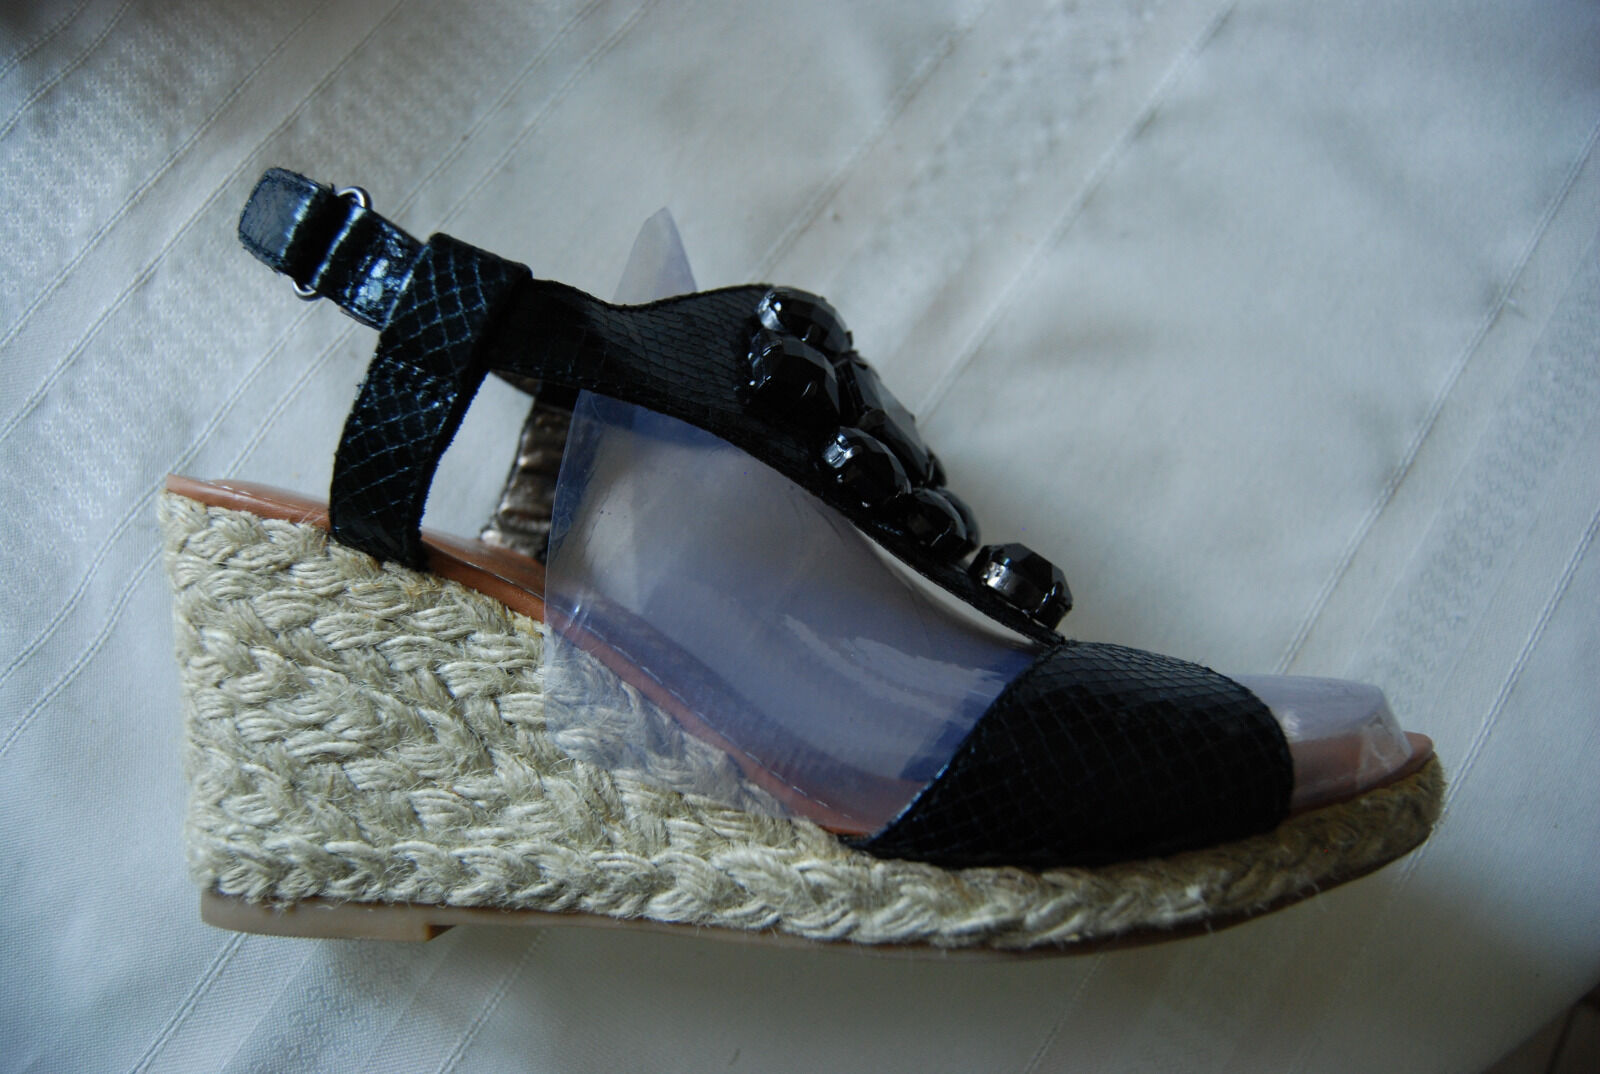 Black Snakeskin Texture LIBBY 8.5 EDELMAN Billie OpenToe Jeweled Wedges 8.5 LIBBY W e3e0c4